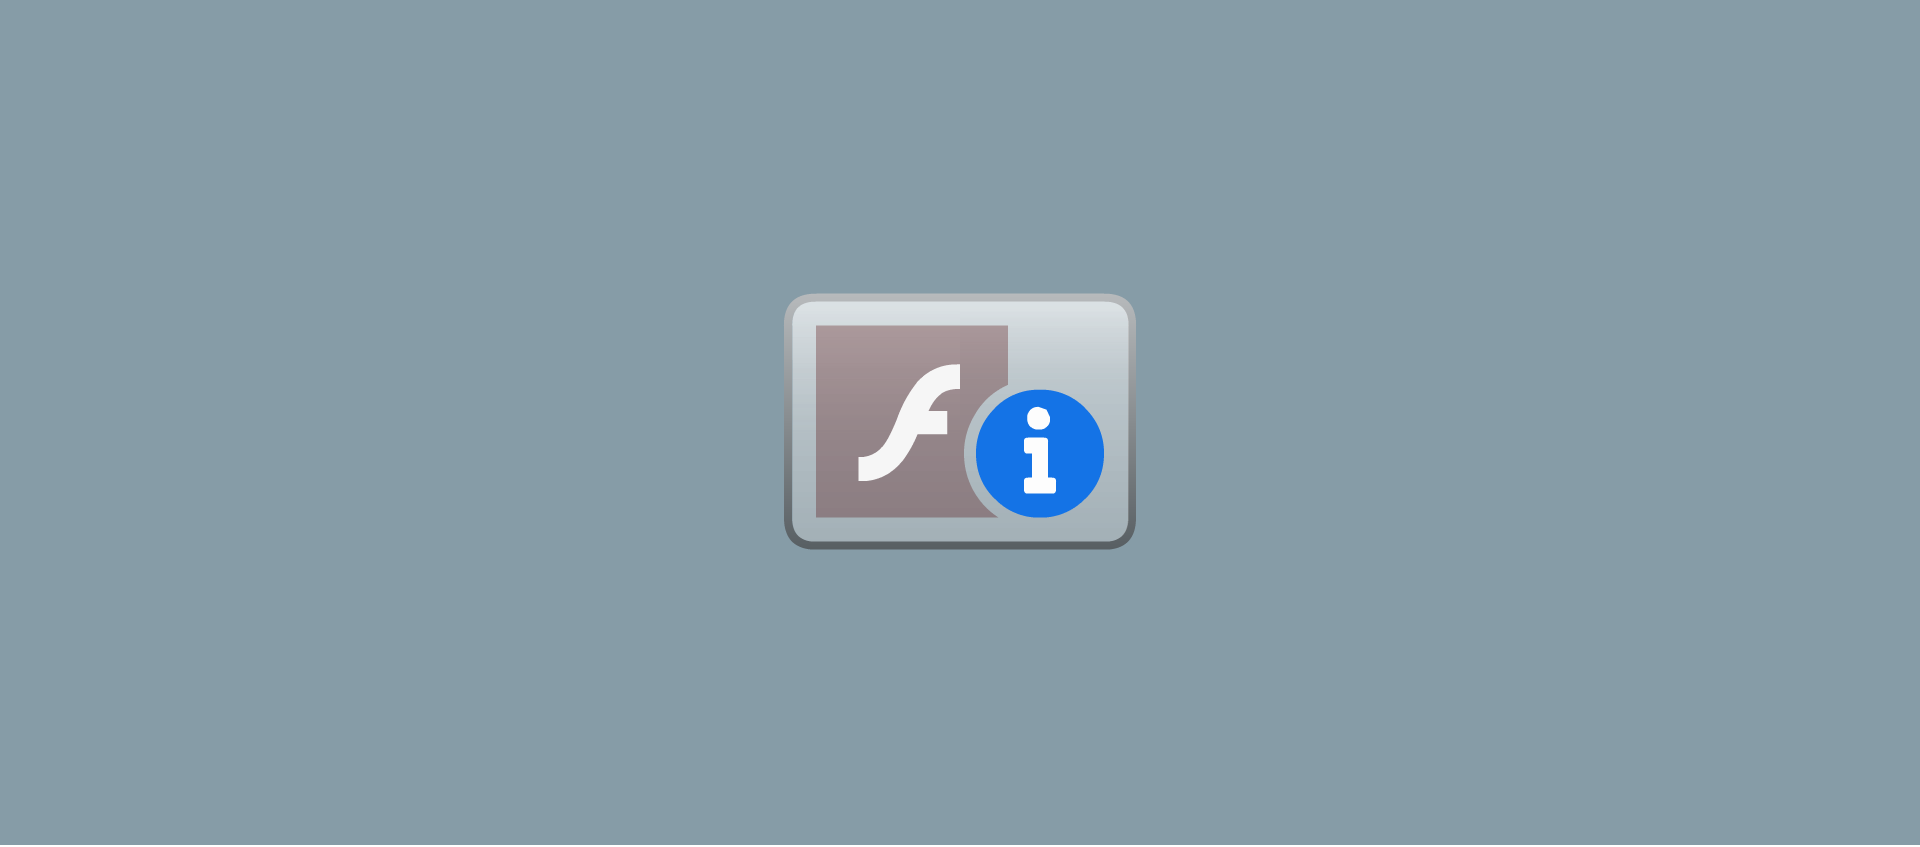 Internet Explorer 11 Enable Flash After 11 January 2021 Microsoft Community